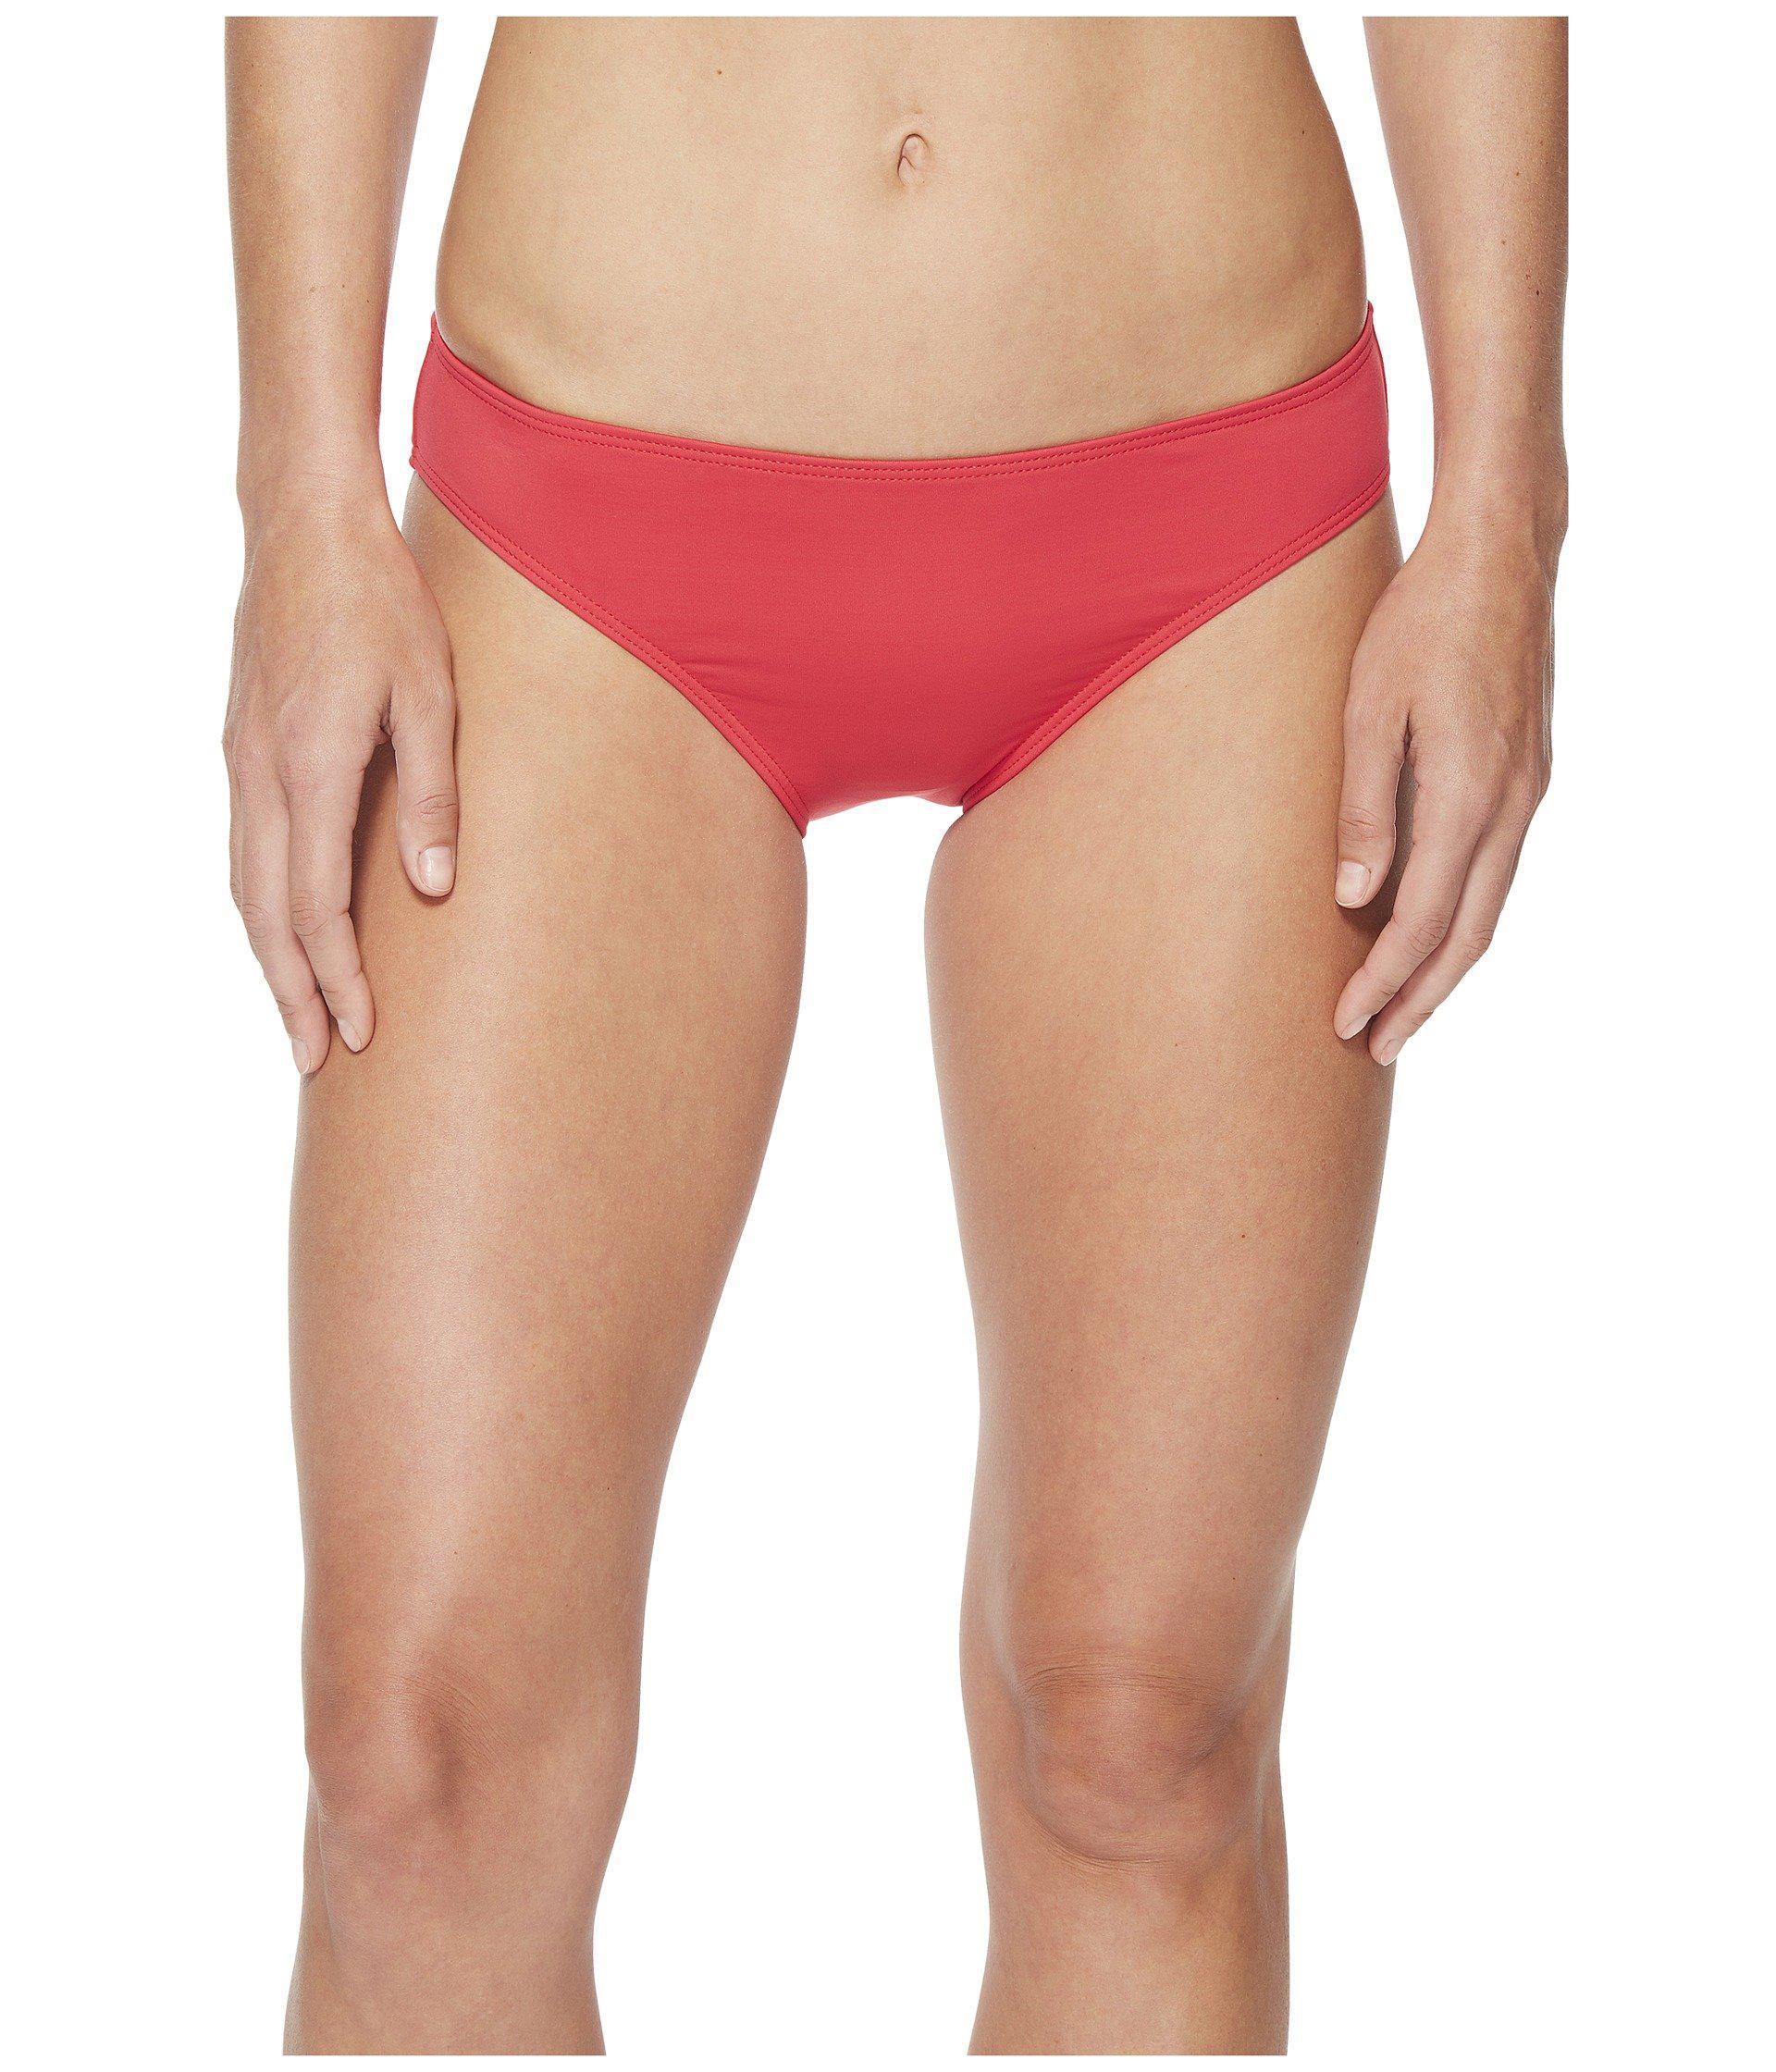 4aed93dbbf Lauren by Ralph Lauren. Women's Beach Club Solids Solid Hipster Bottoms